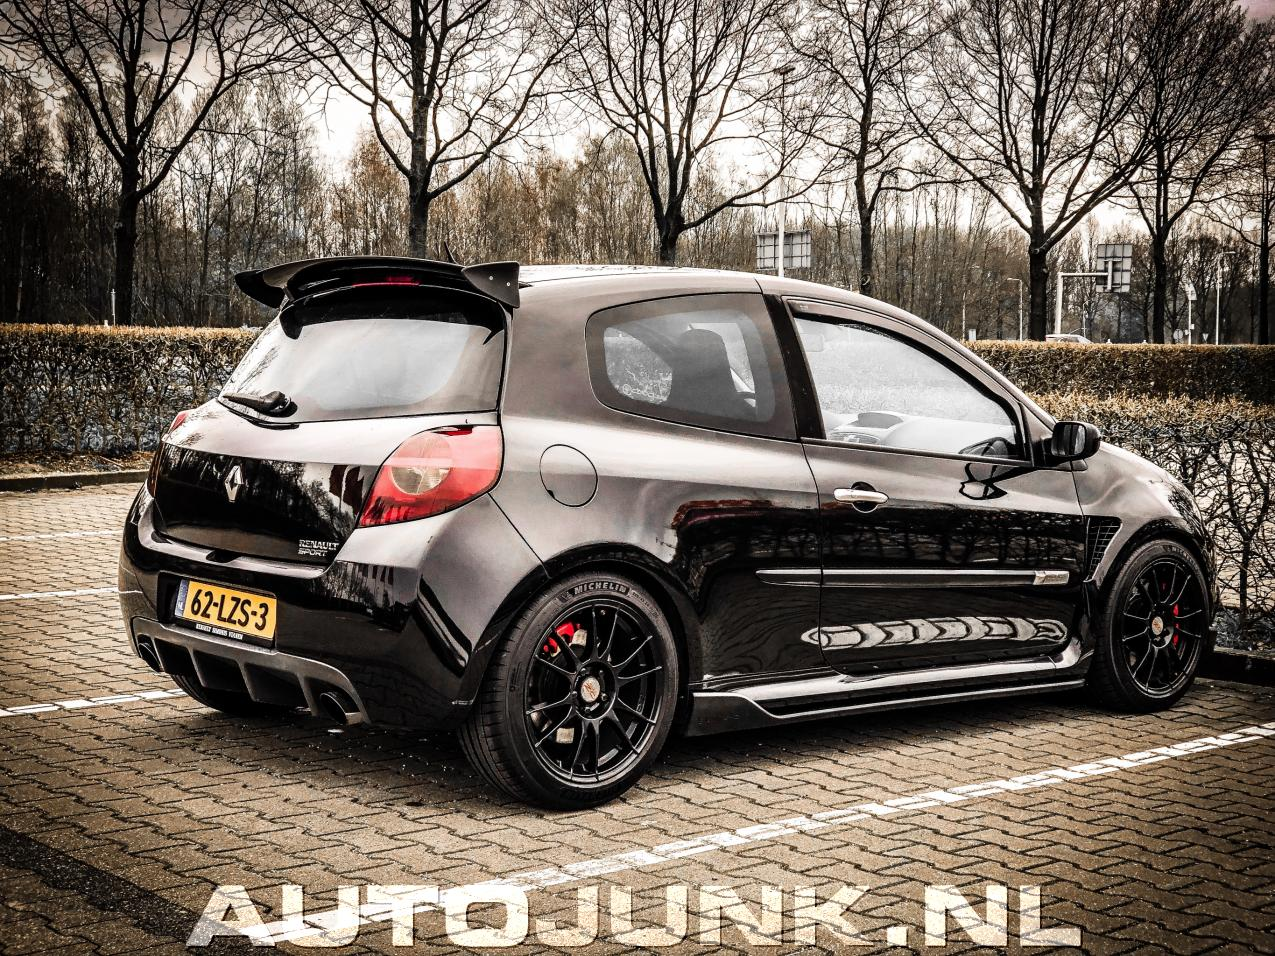 Mijn Renault Clio Rs Fotos Autojunknl 236917